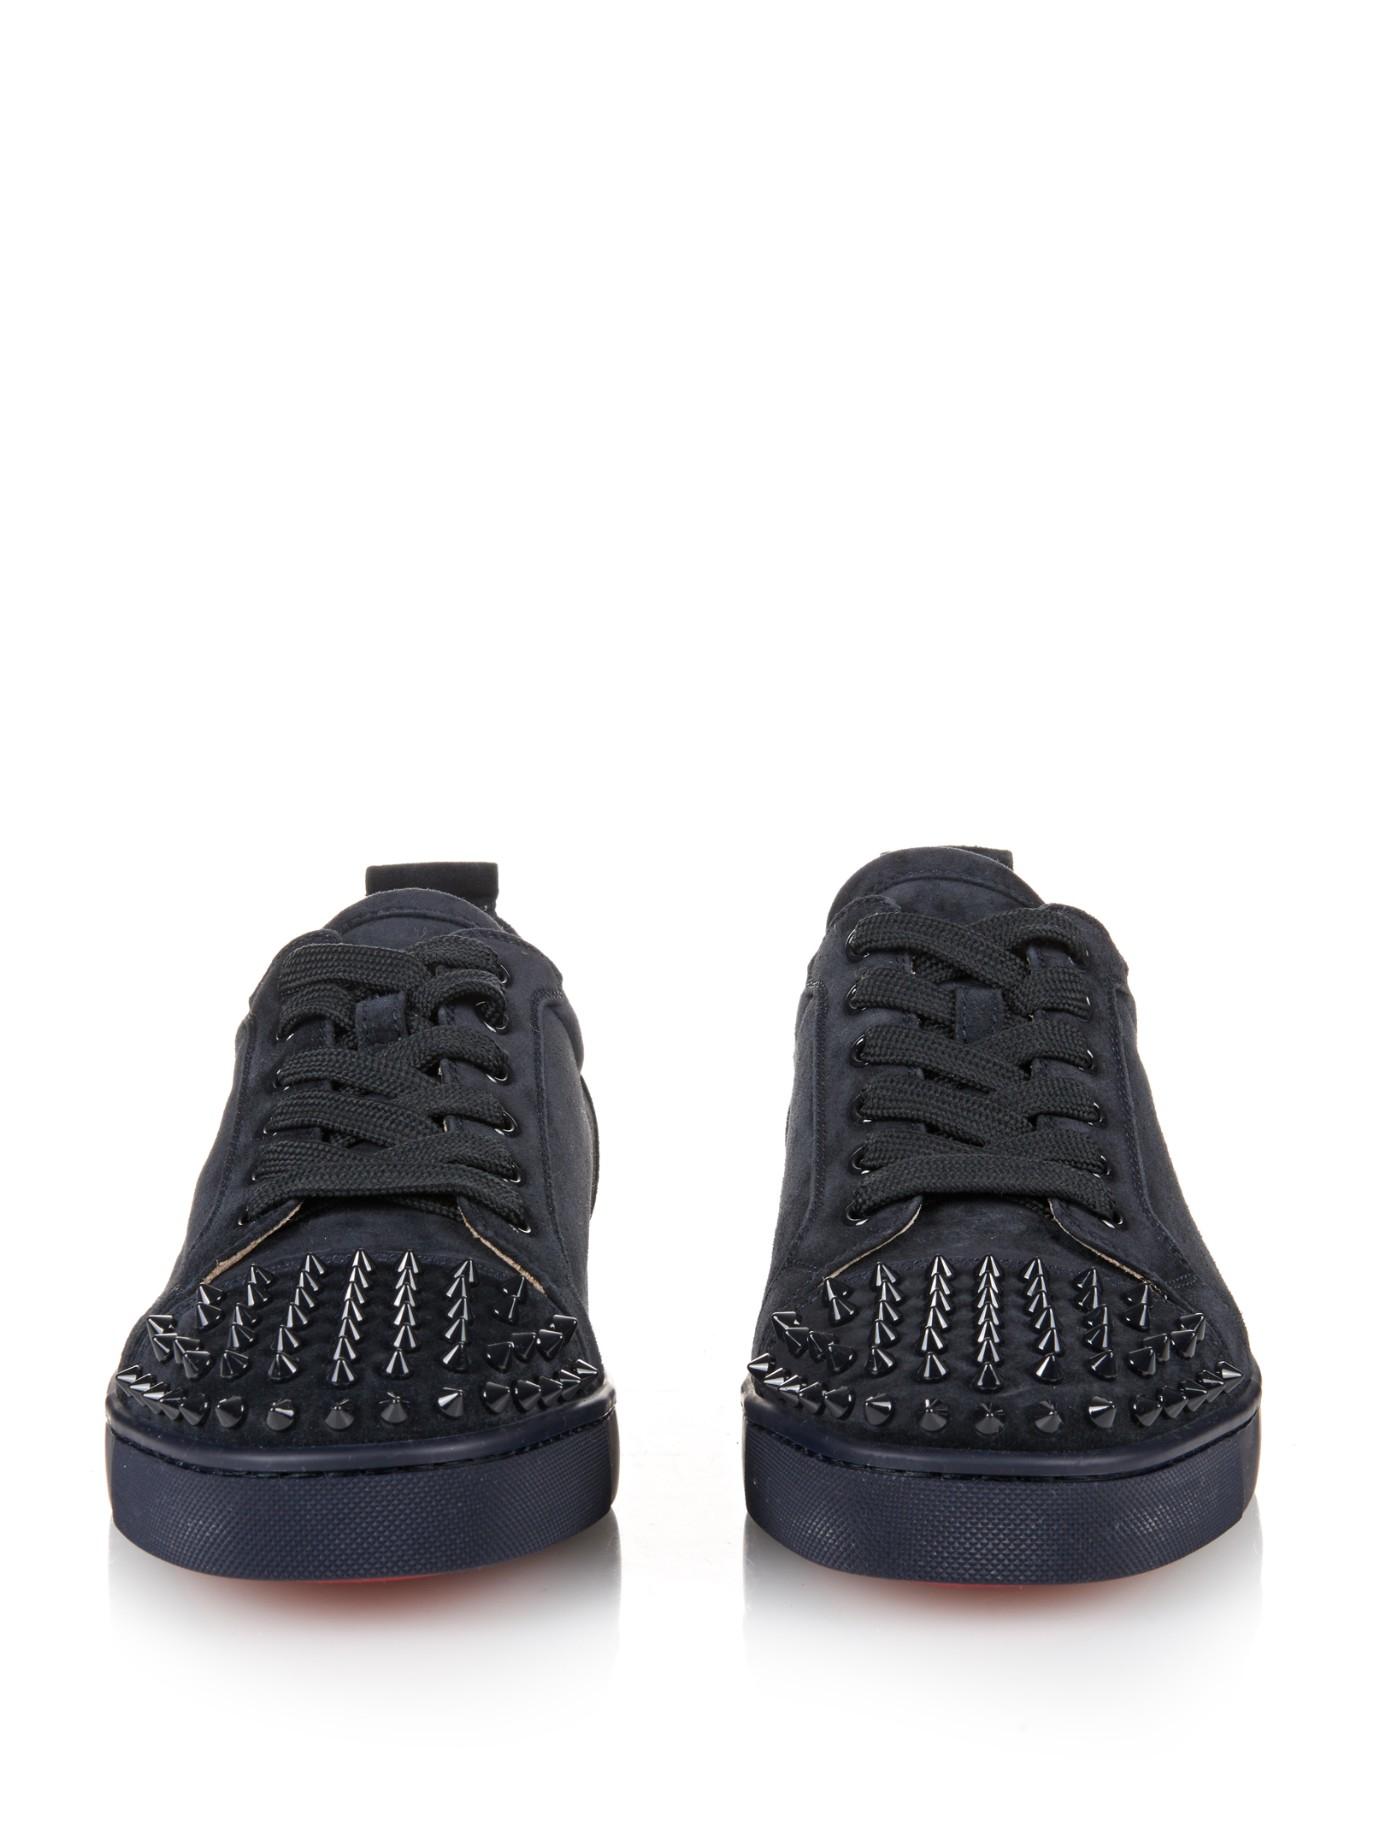 check out da10b 2fc1c Men's Blue Louis Suede Low-Top Sneakers